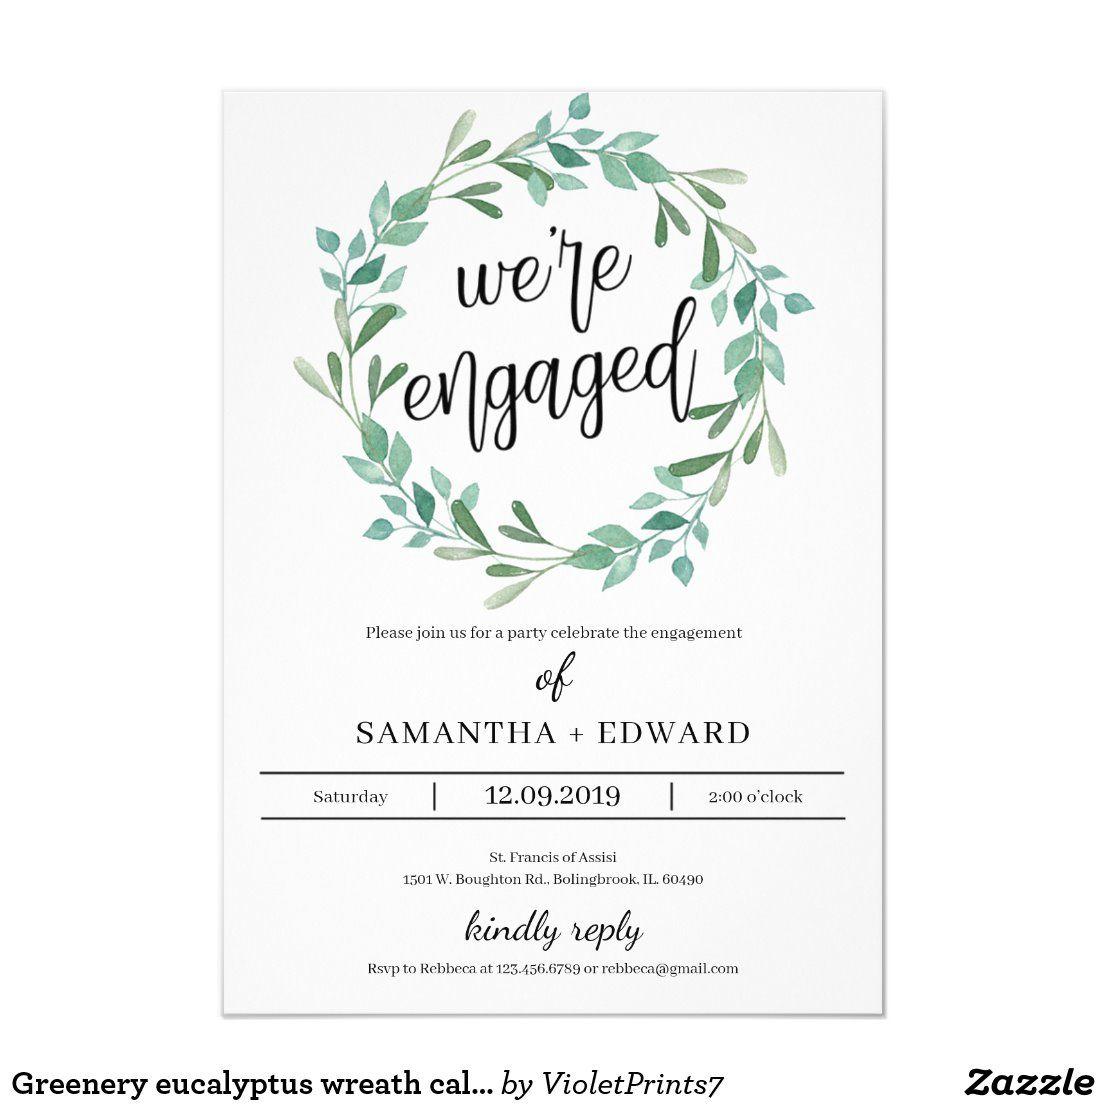 Photo of Green Eucalyptus Wreath Callygraphy Engagement Invitation | Zazzle.com